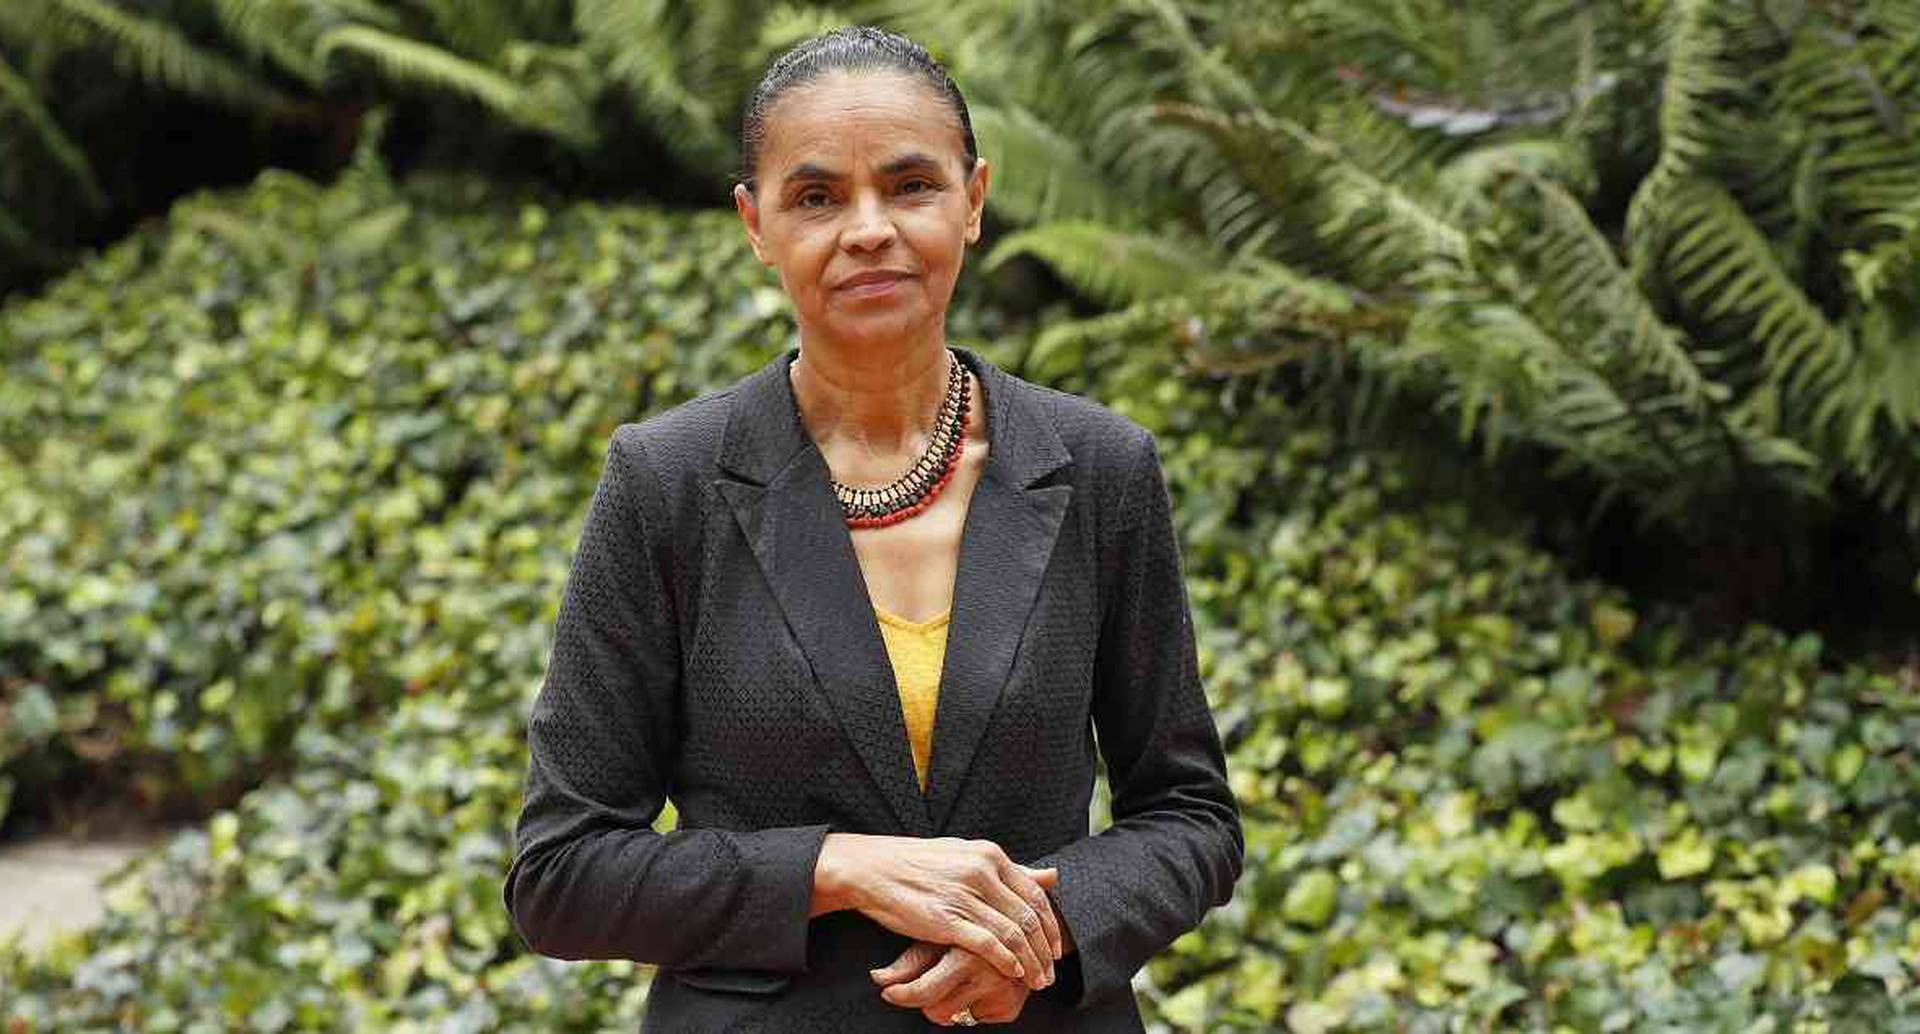 Marina Silva fue ministra de ambiente de Brasil de 2003 a 2008. Foto: León Darío Peláez